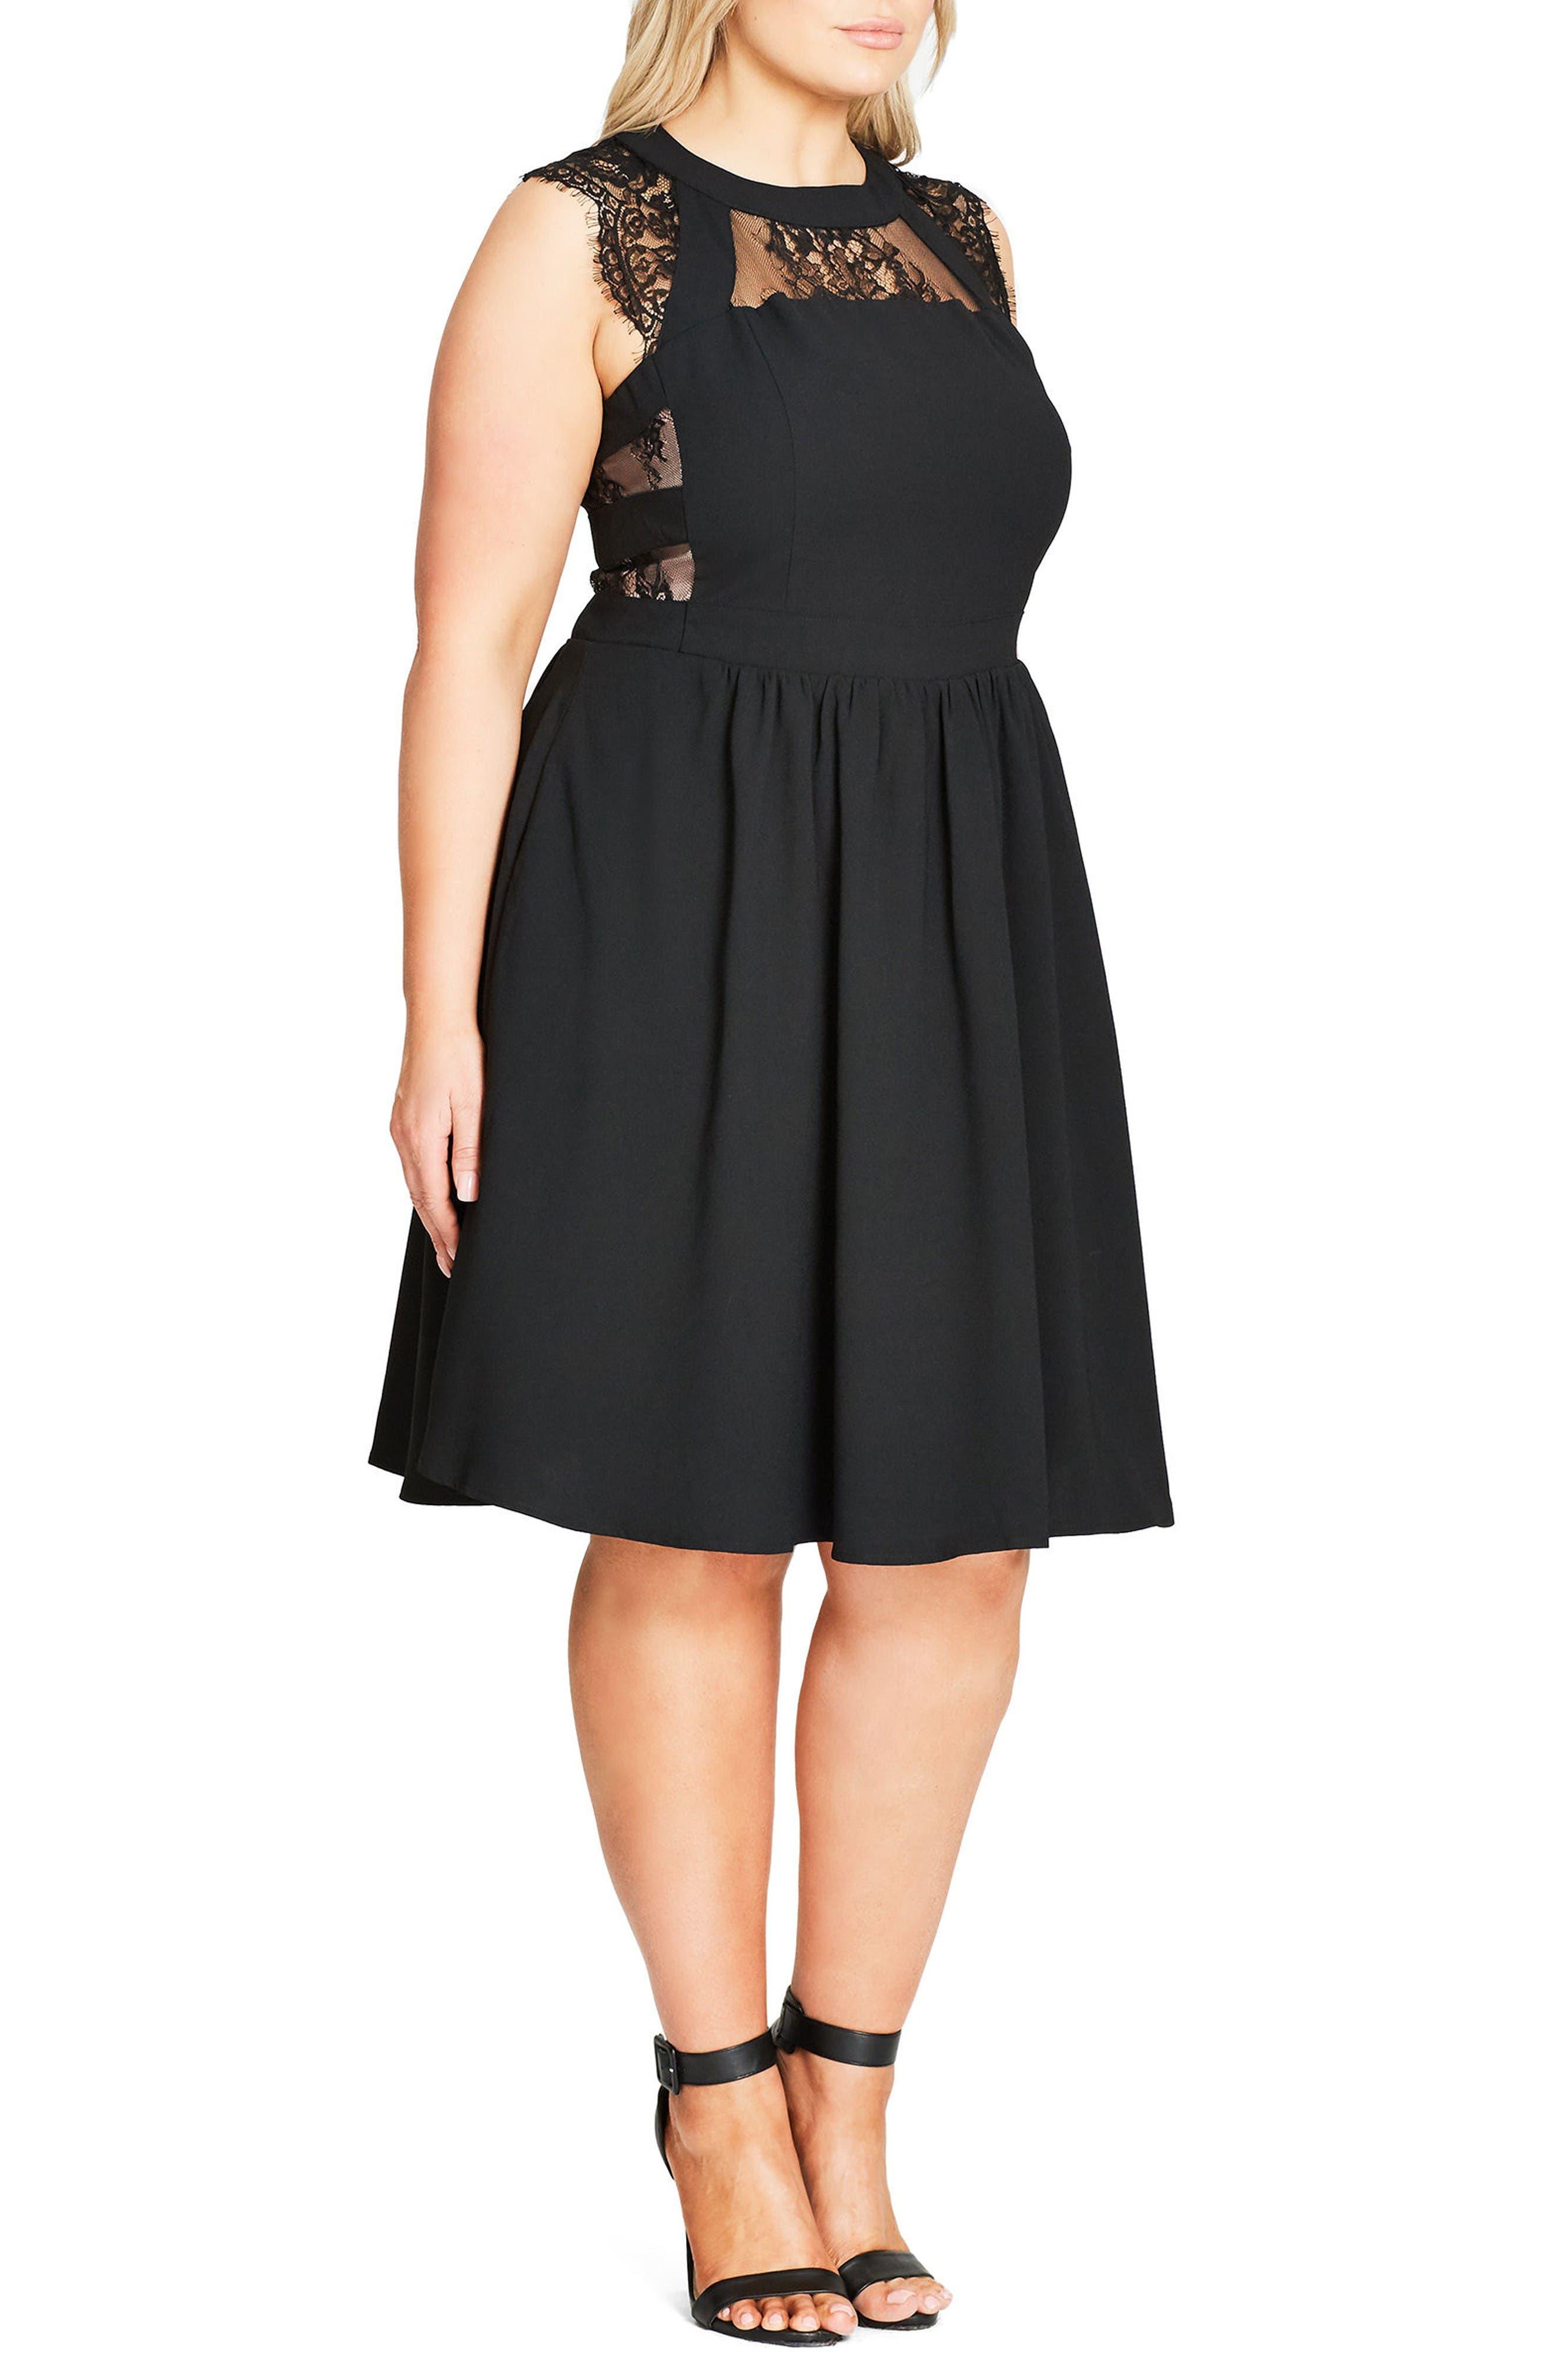 Cage Dress,                             Alternate thumbnail 3, color,                             Black